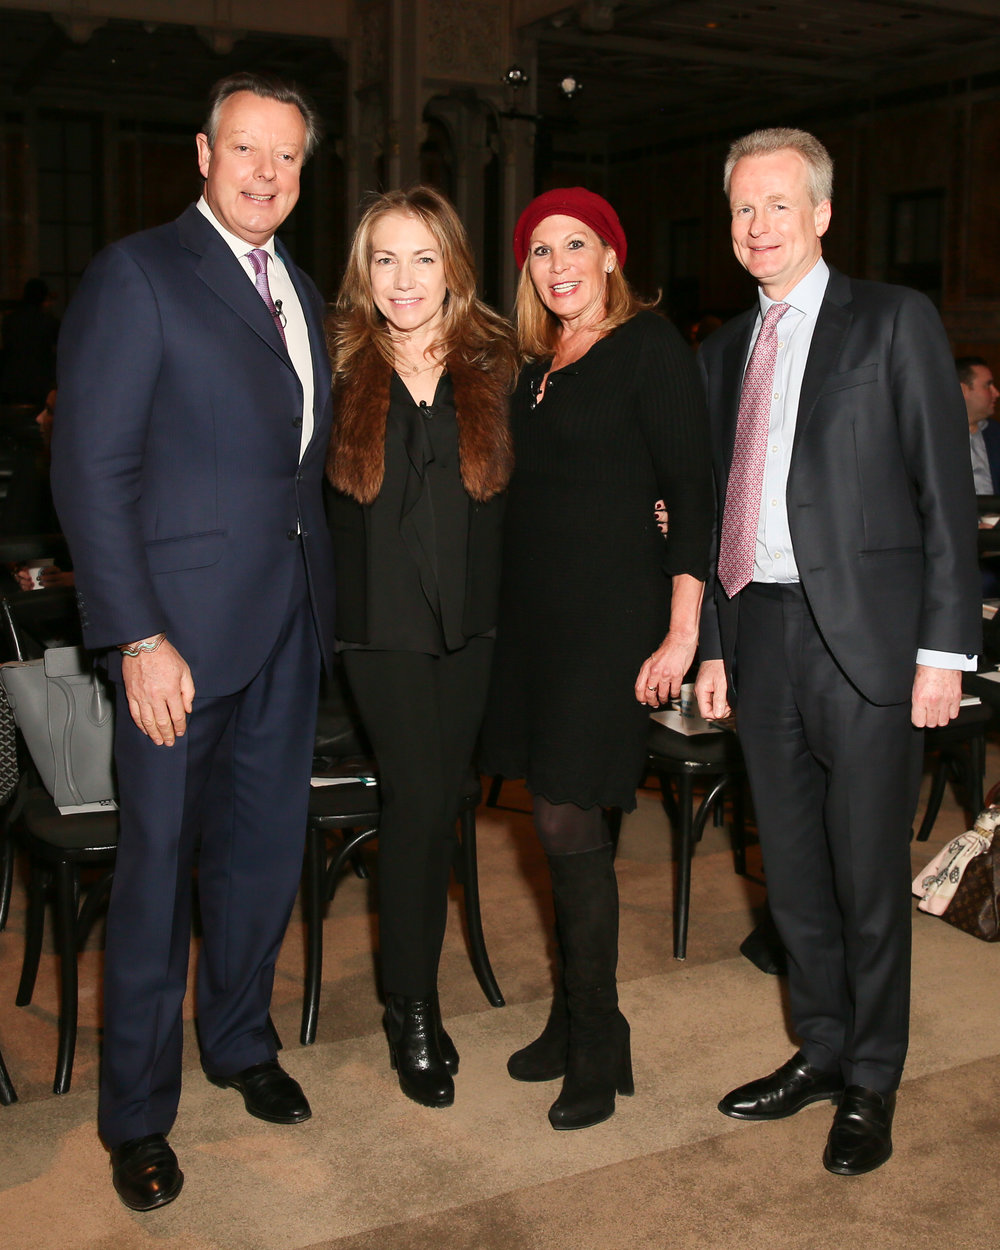 Lord Andrew Hay, Susan de Franca, Dottie Herman & Paddy Dring